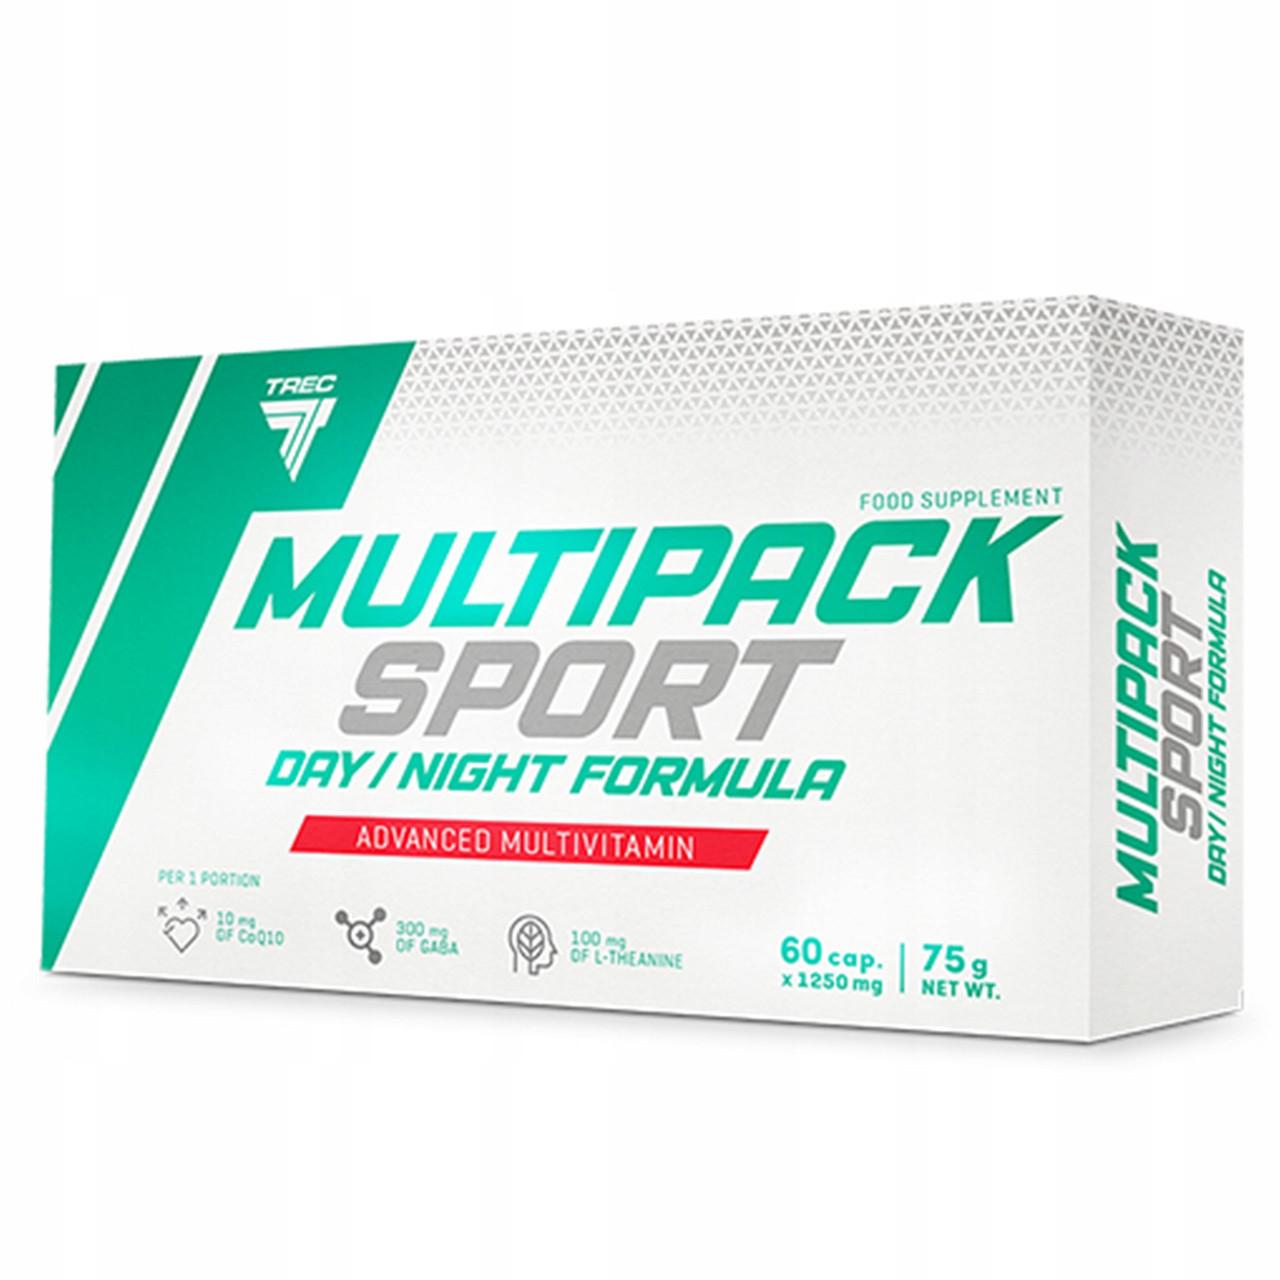 Витамины Trec Nutrition Multipack Sport Day / Night Formula 60 capsules